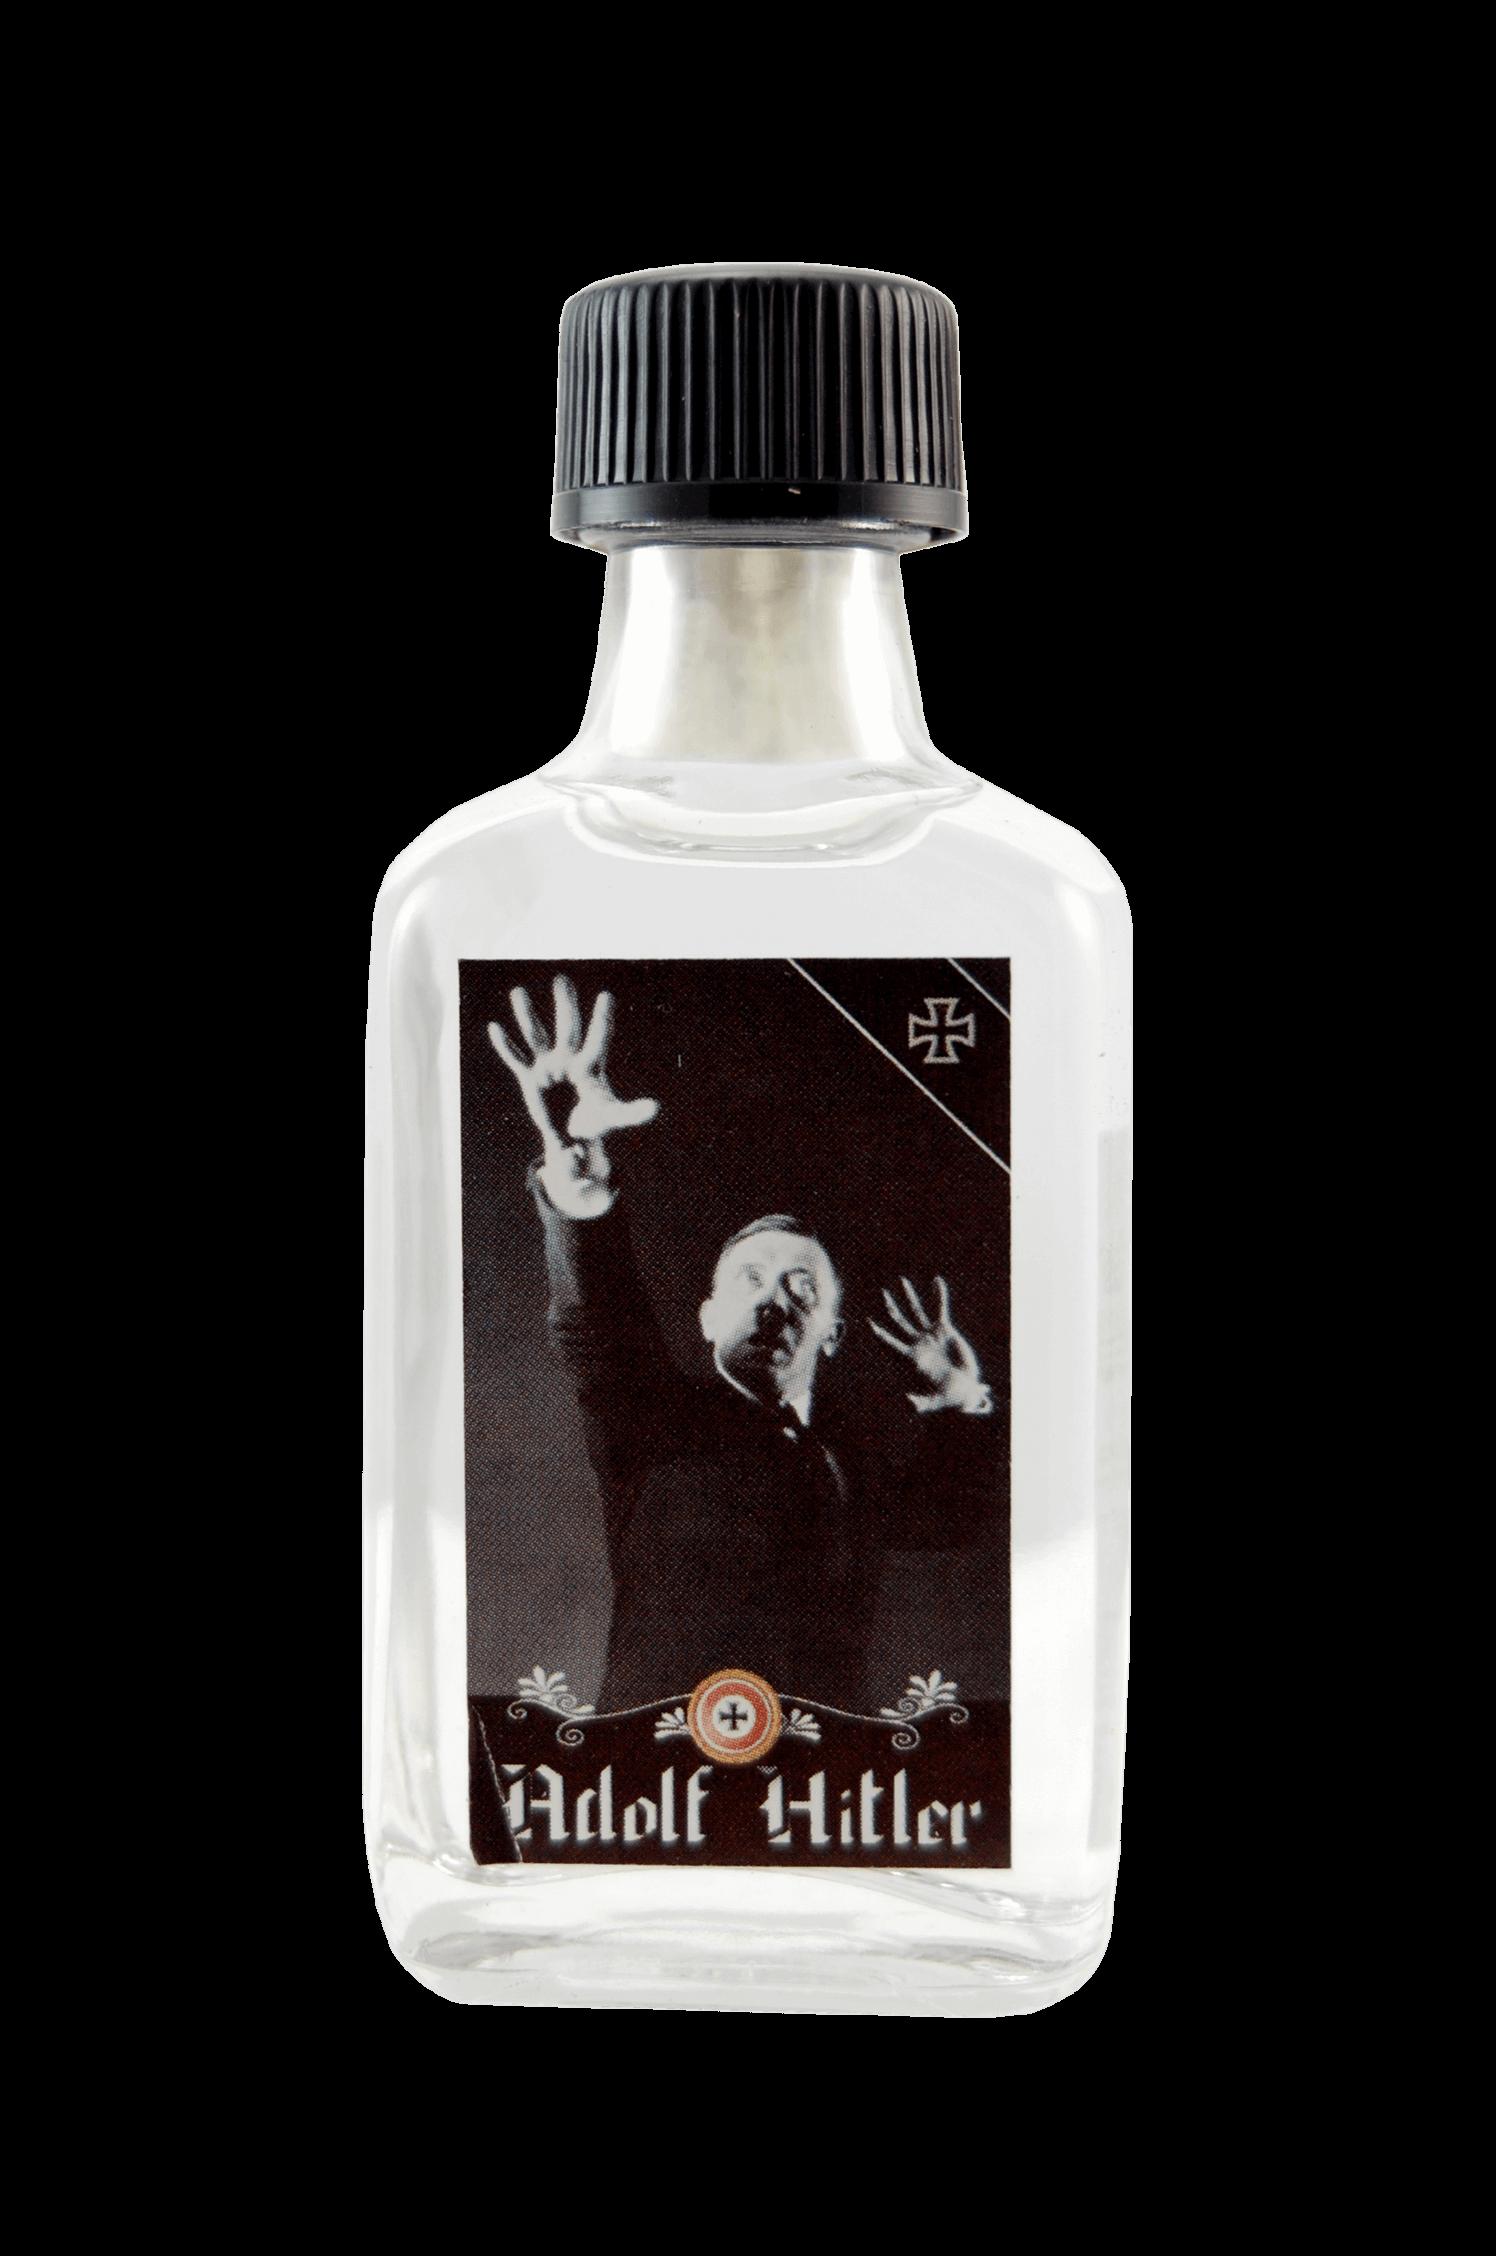 Adolf Hitler Grappa